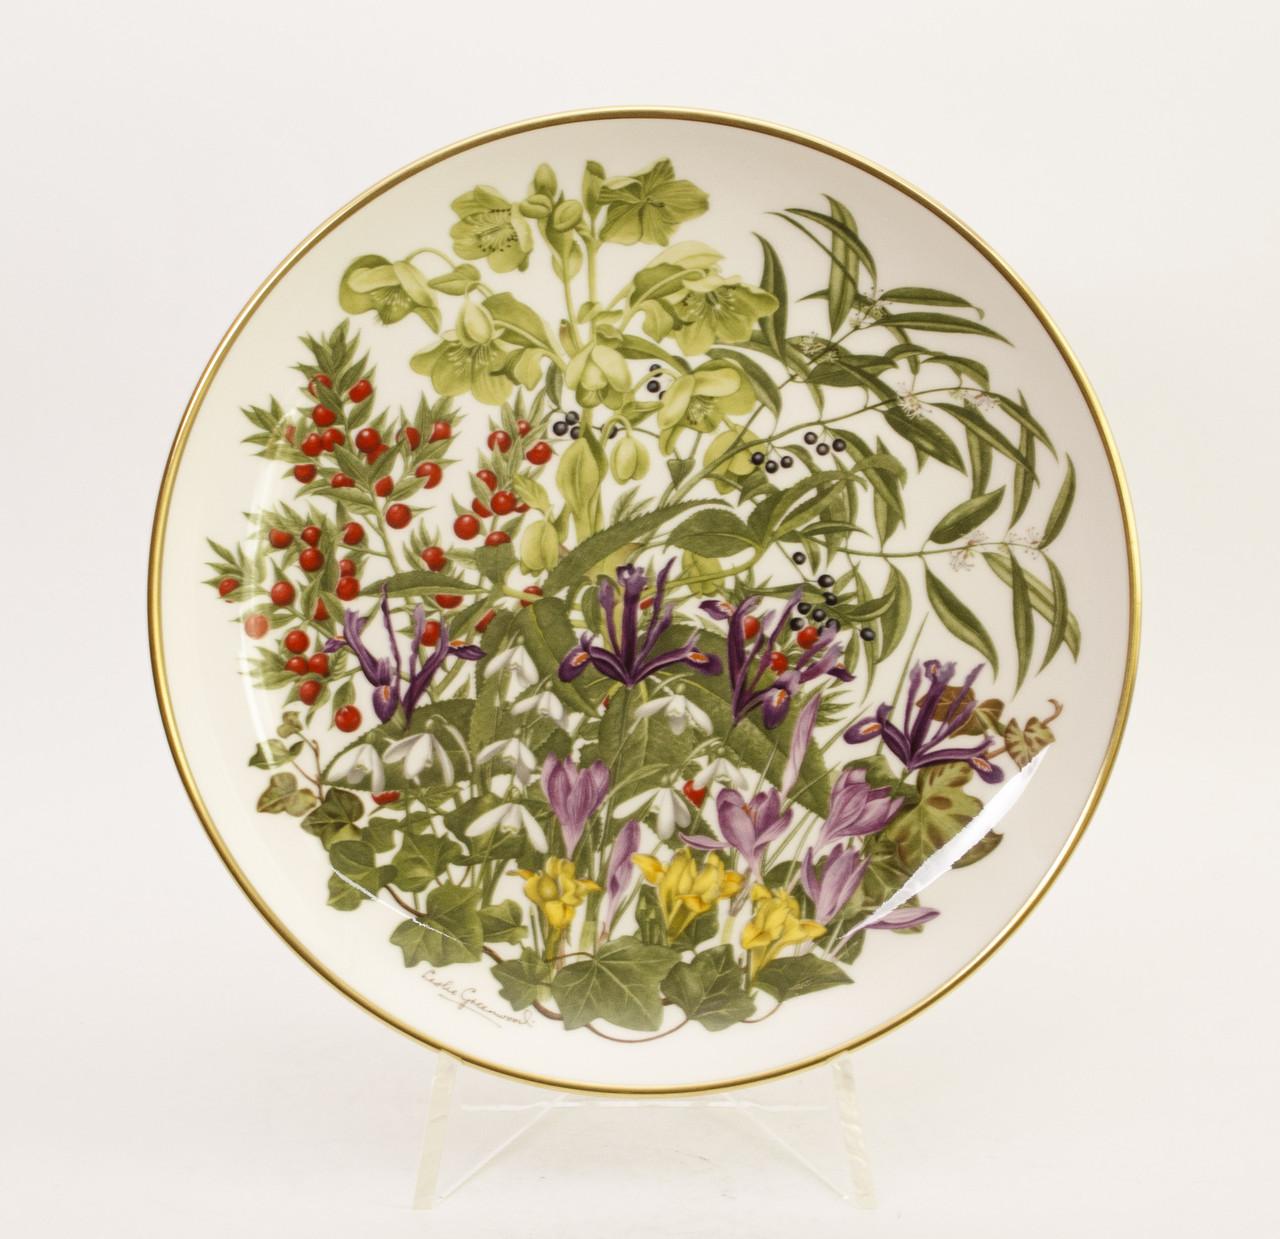 Тарелка коллекционная FRANKLIN PORCELAIN фарфор Англия, февраль